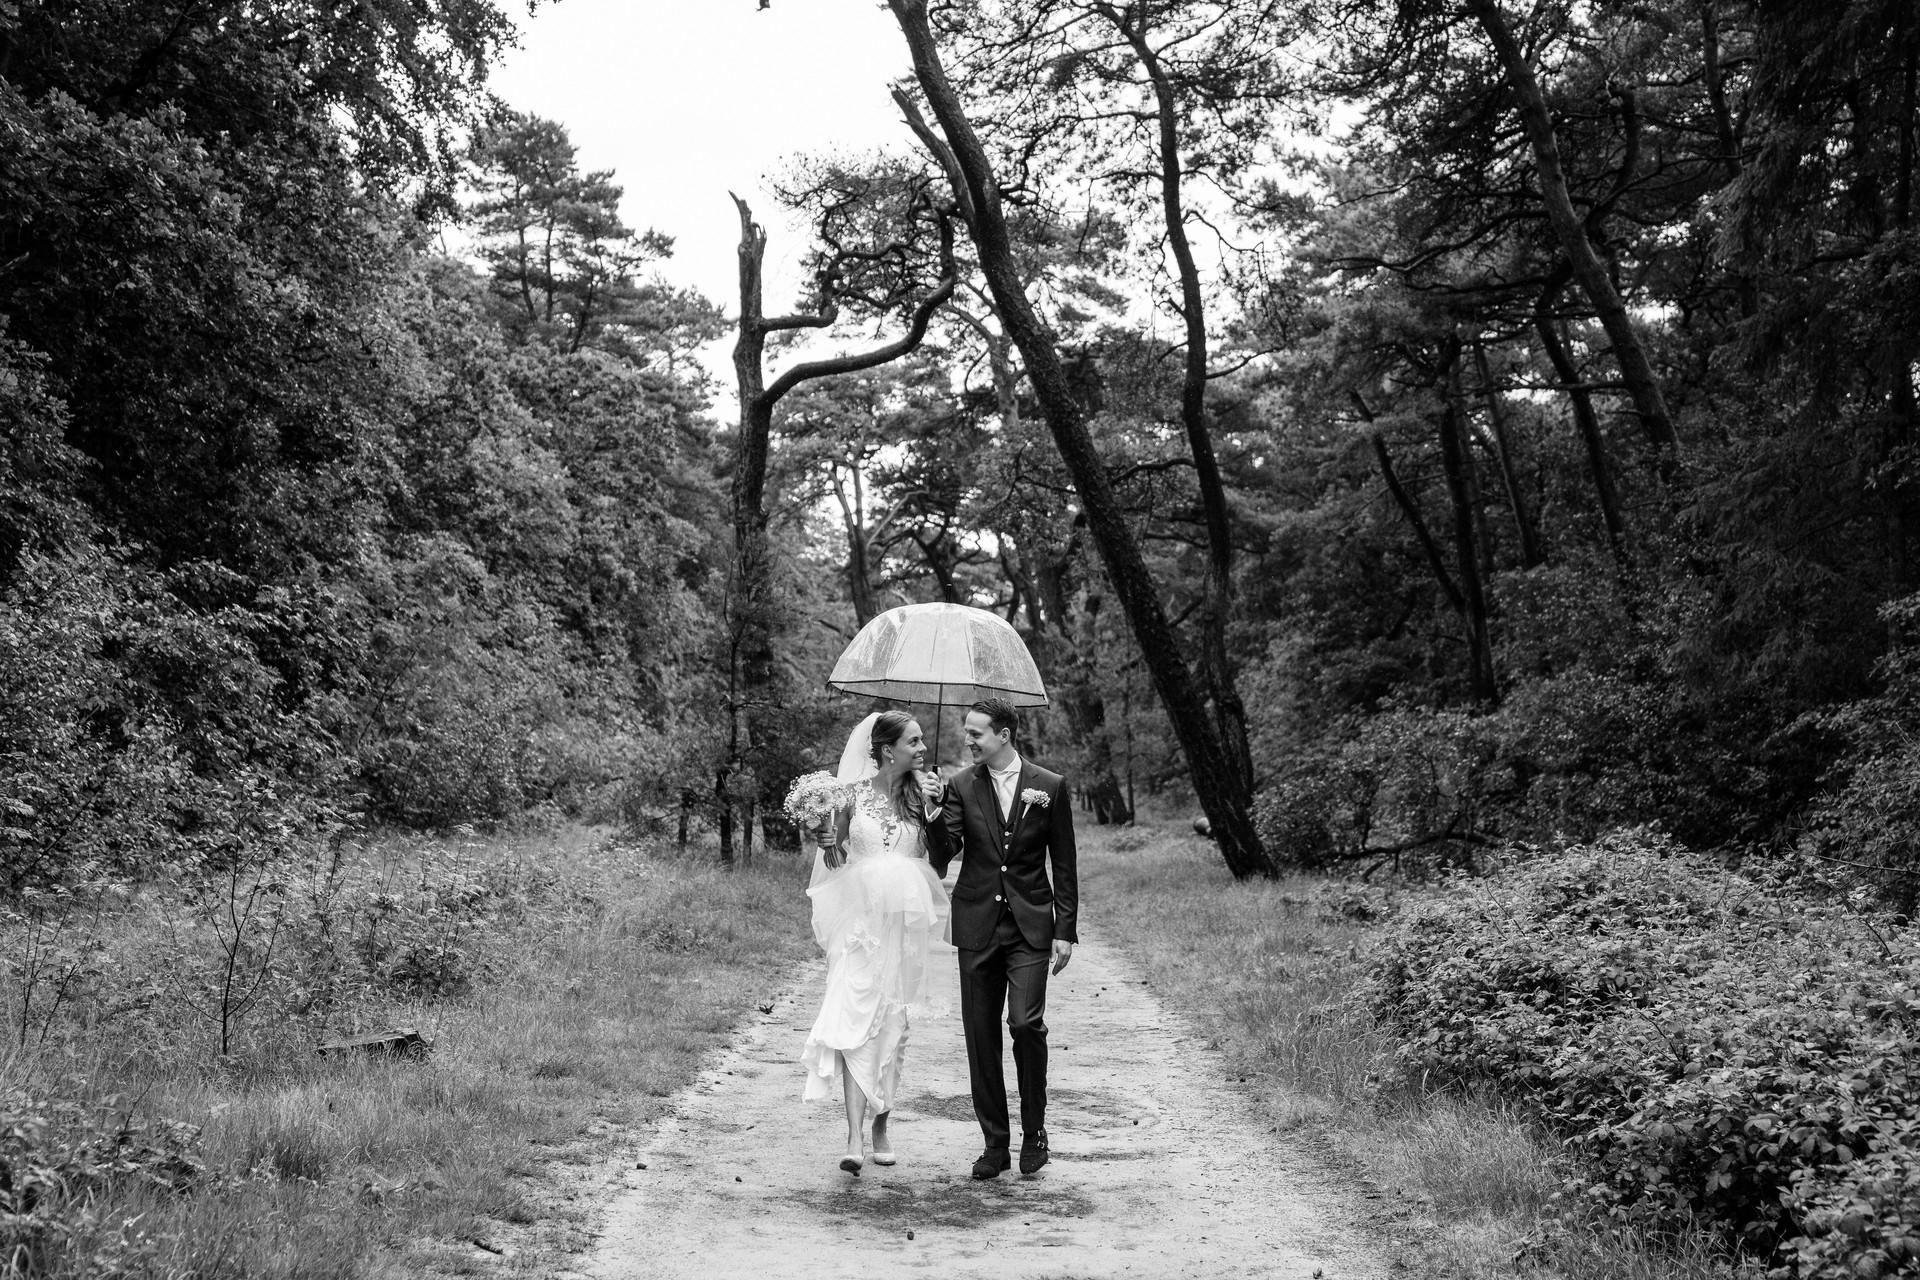 Edwin&Mirelle-Fotoshoot-16.jpg